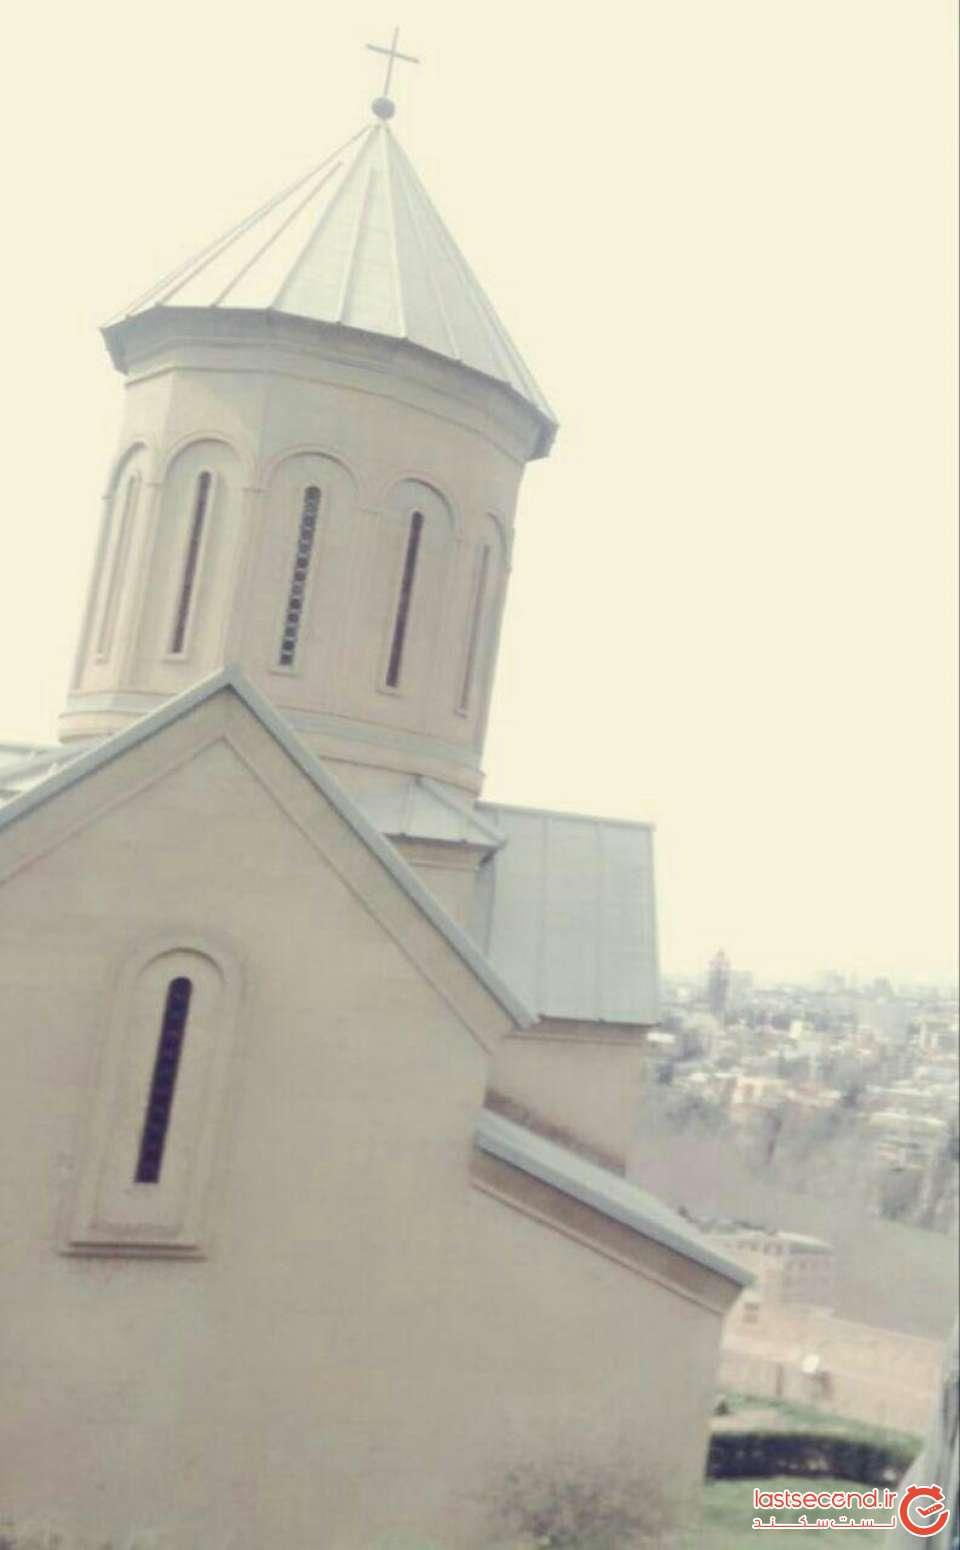 کلیسای سنت نیکلاس(قلعه ناریکالا)1).jpg